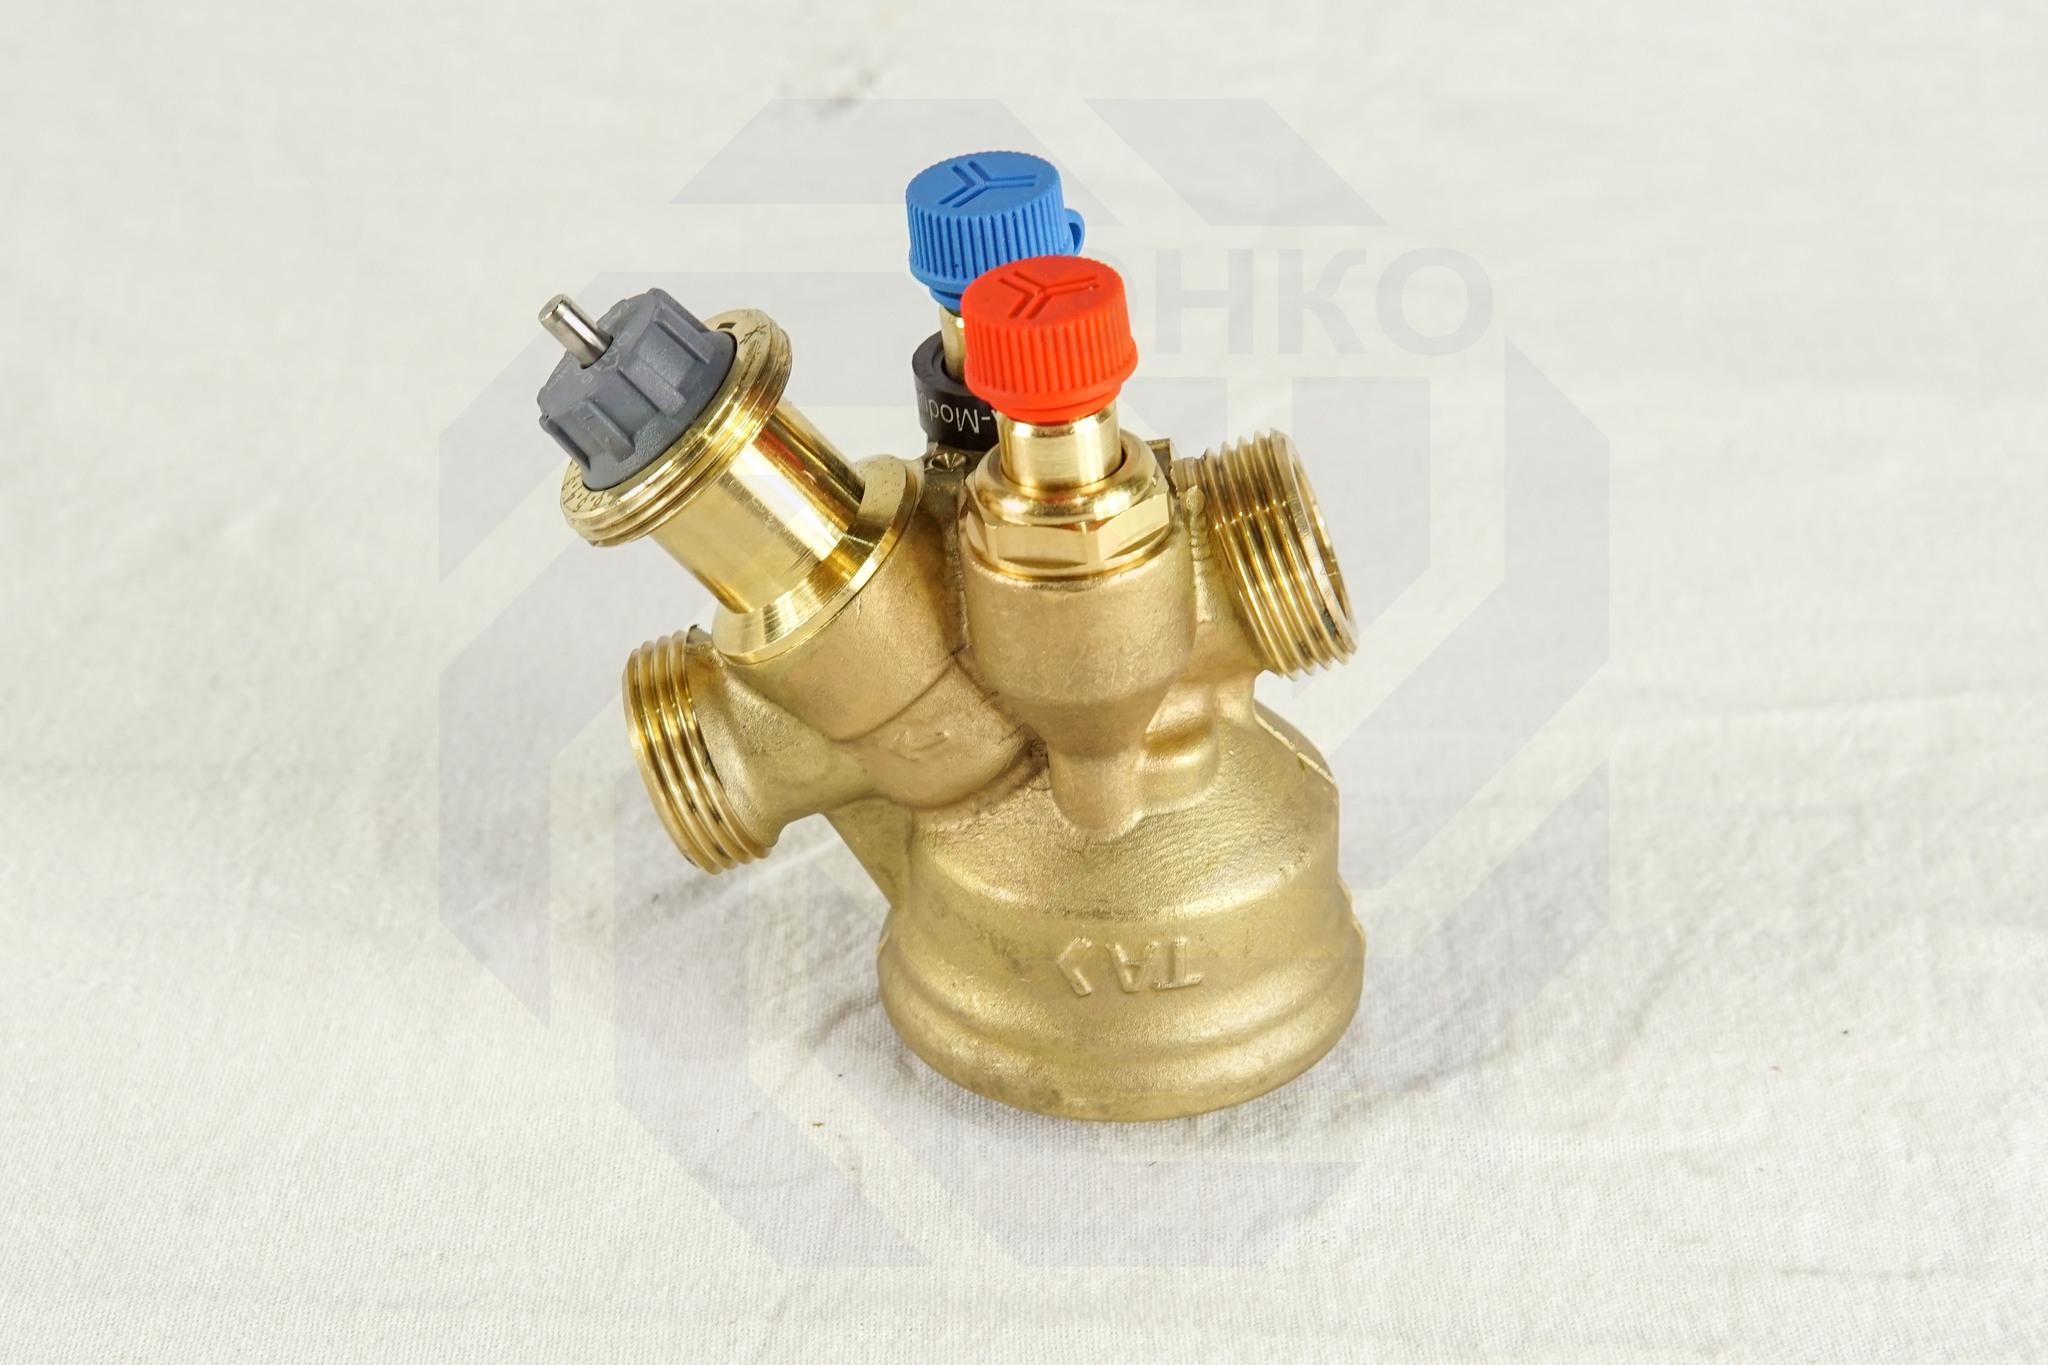 Клапан балансировочный и регулирующий IMI TA-Modulator DN 15